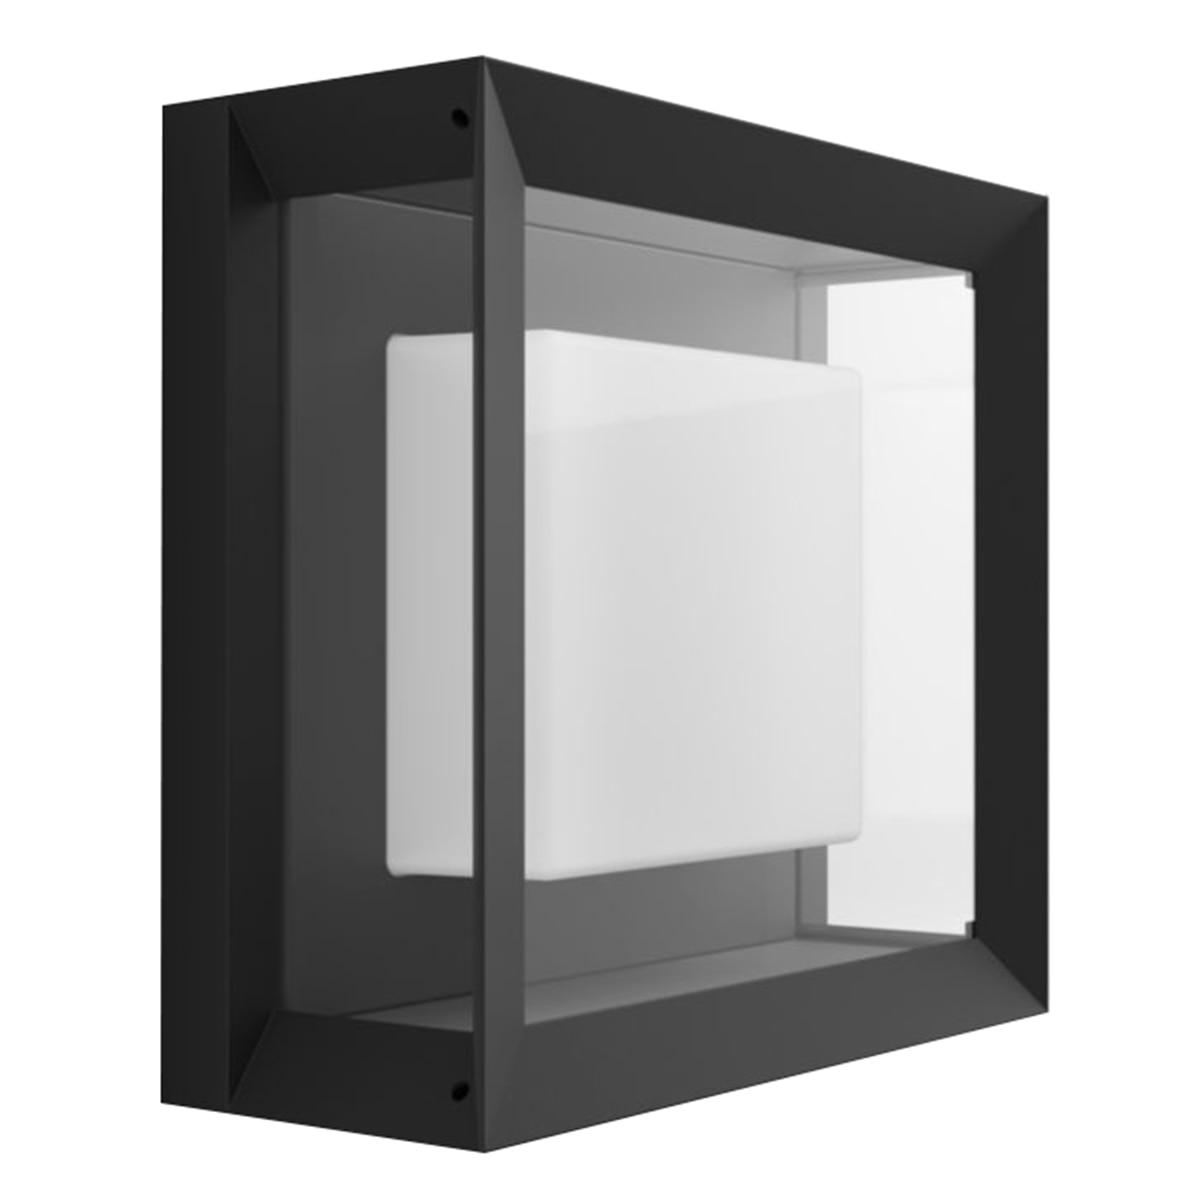 Fotografie Aplica exterior LED RGBW integrat Philips Econic HUE, control inteligent cu Hue Bridge, 15W (79W), 1150 lm, lumina alba/color, IP44, patrat, metal/sticla, Negru